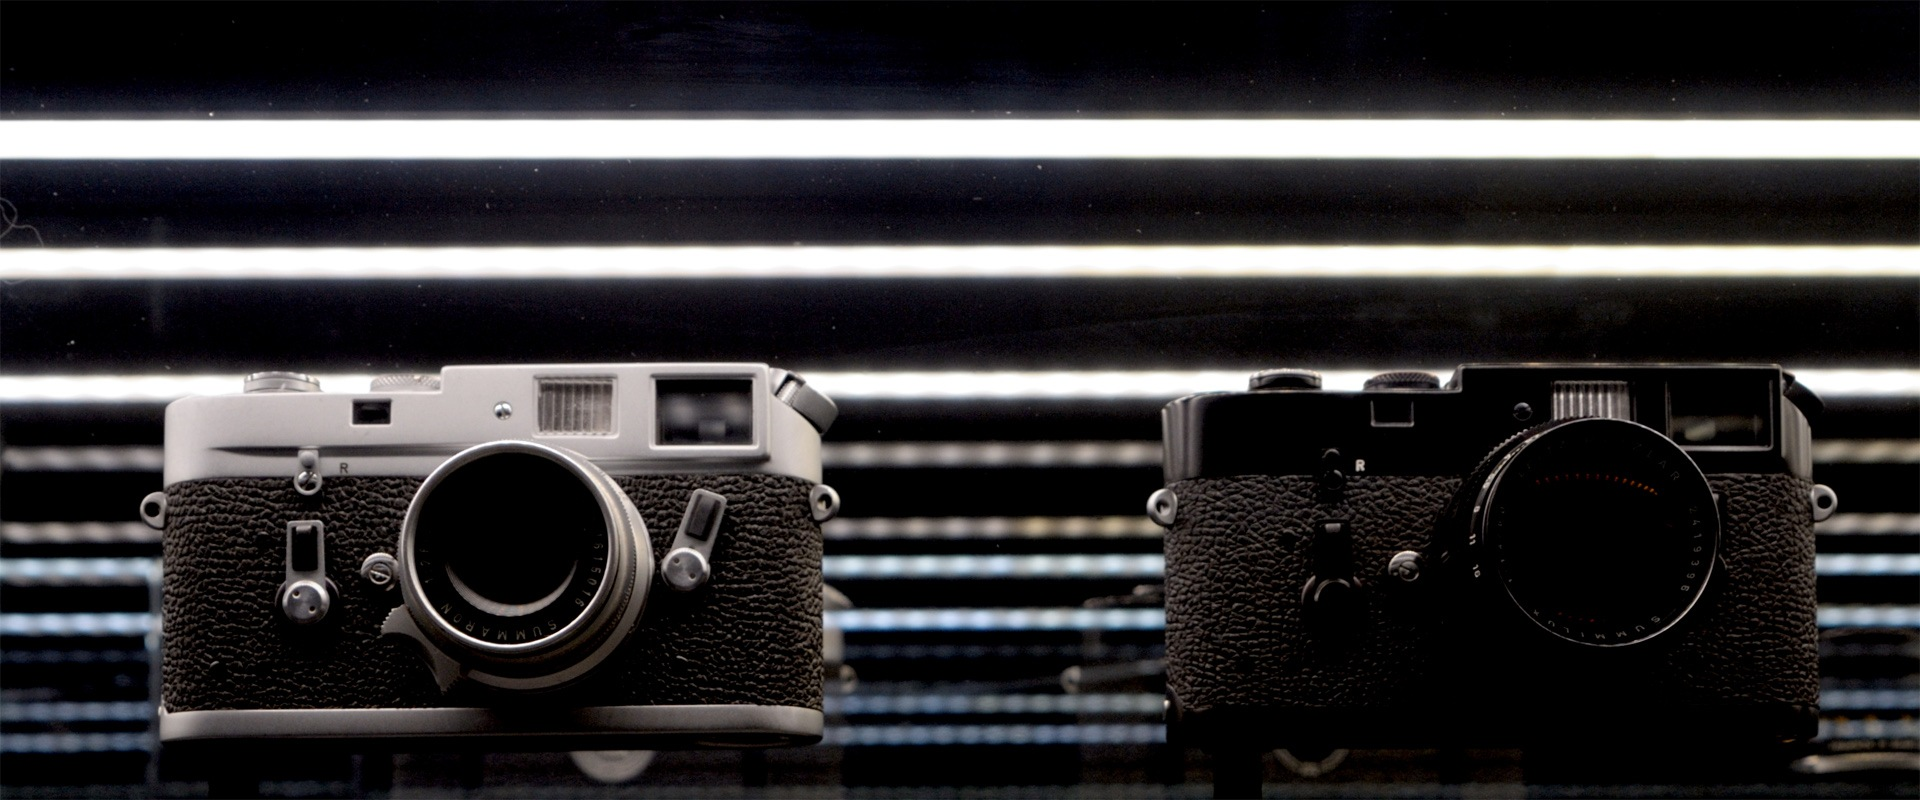 camera stream by Funktrainer